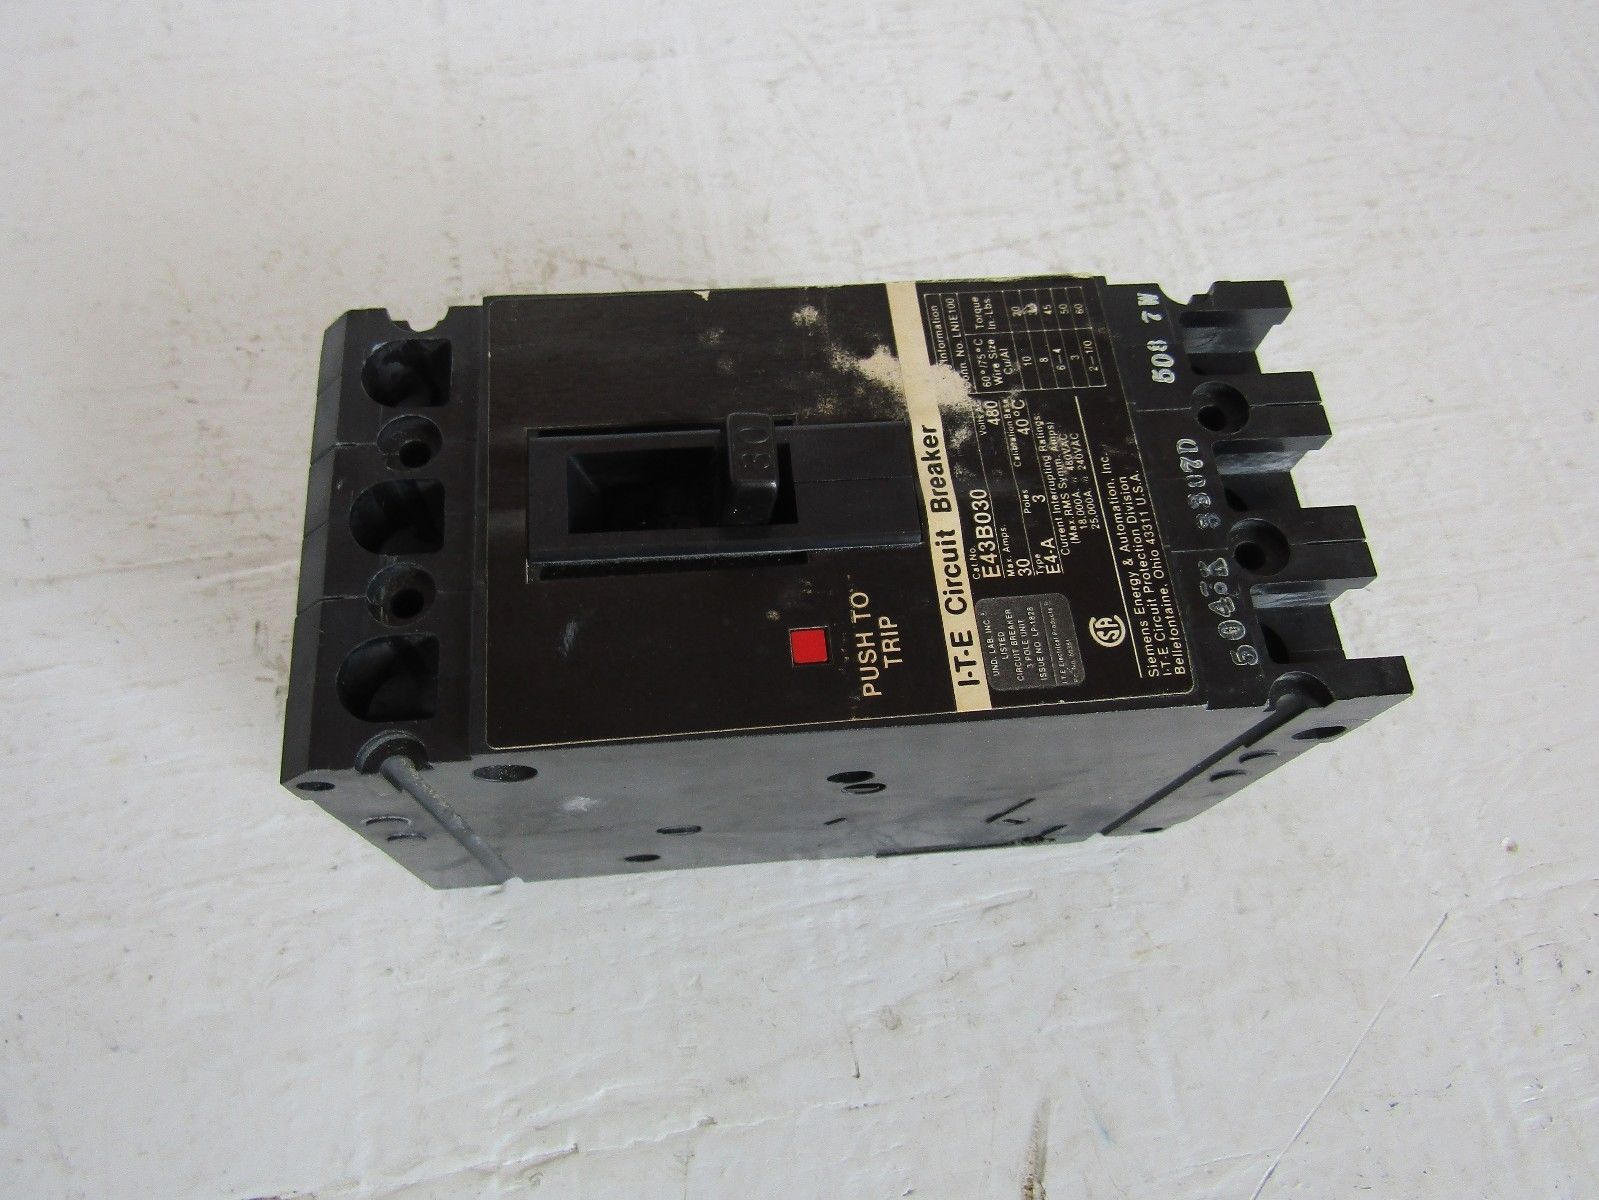 LTD121C32F LTD121C32S LTD121C33S LTD121C33U LTD121C34S LTD121C34U New LCD